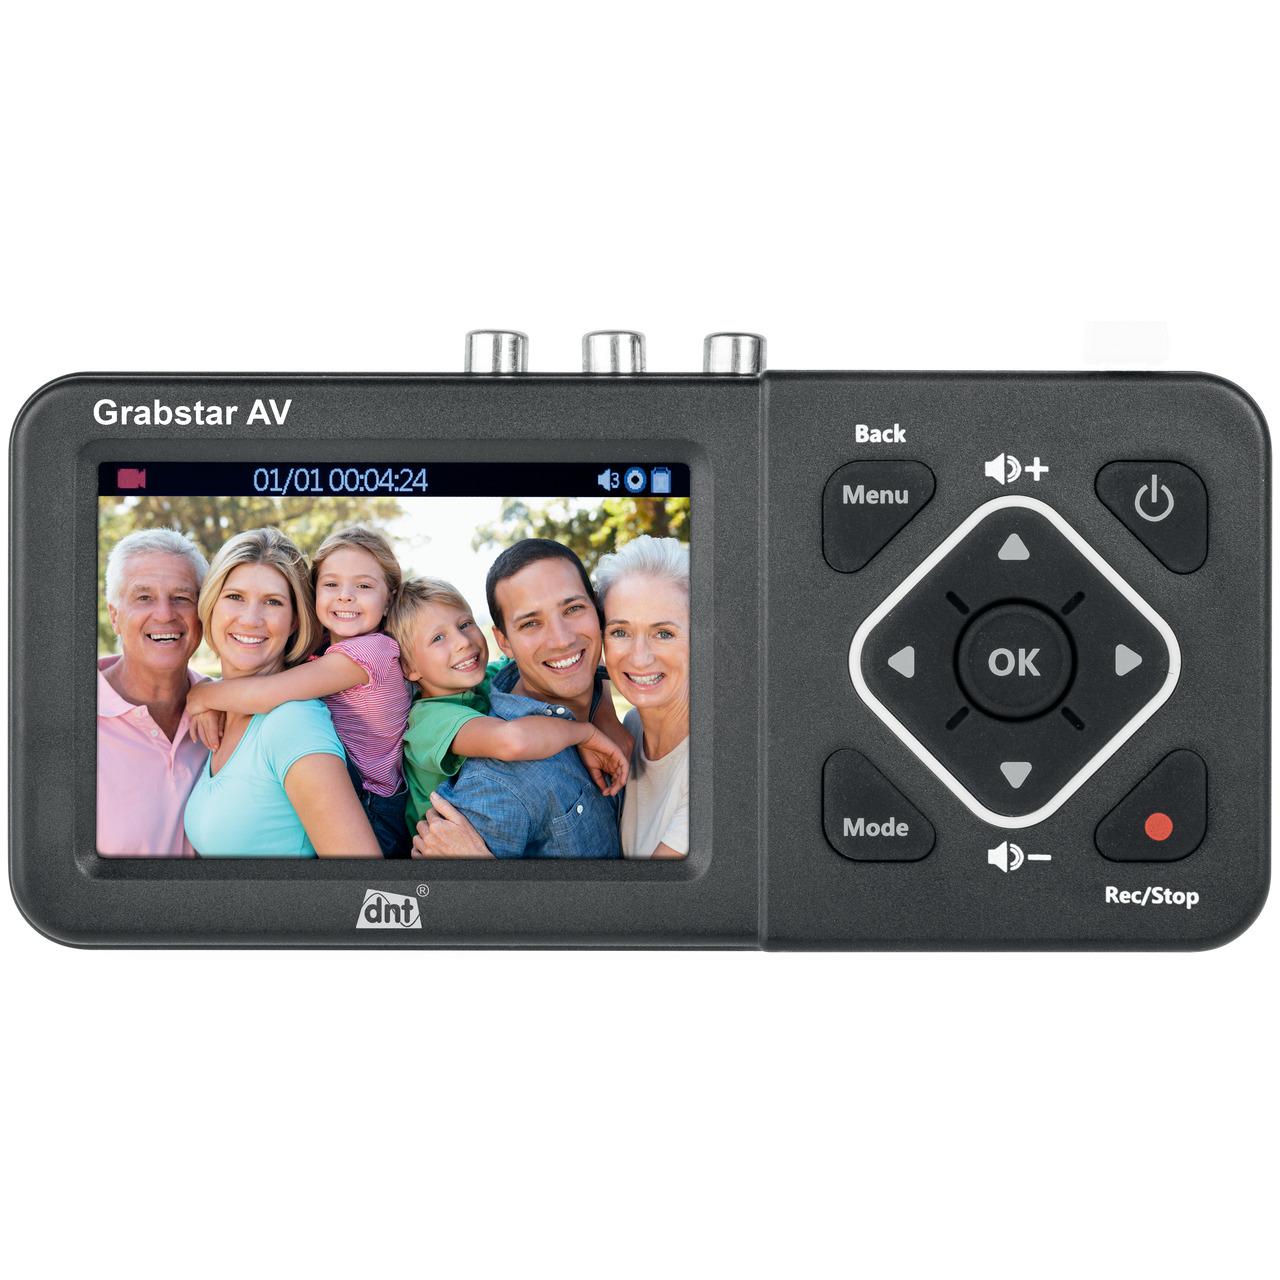 dnt Video-Digitalisierer Grabstar AV- 8-9 cm (3-5) Vorschaudisplay- S-Video- speichert auf USB- SD